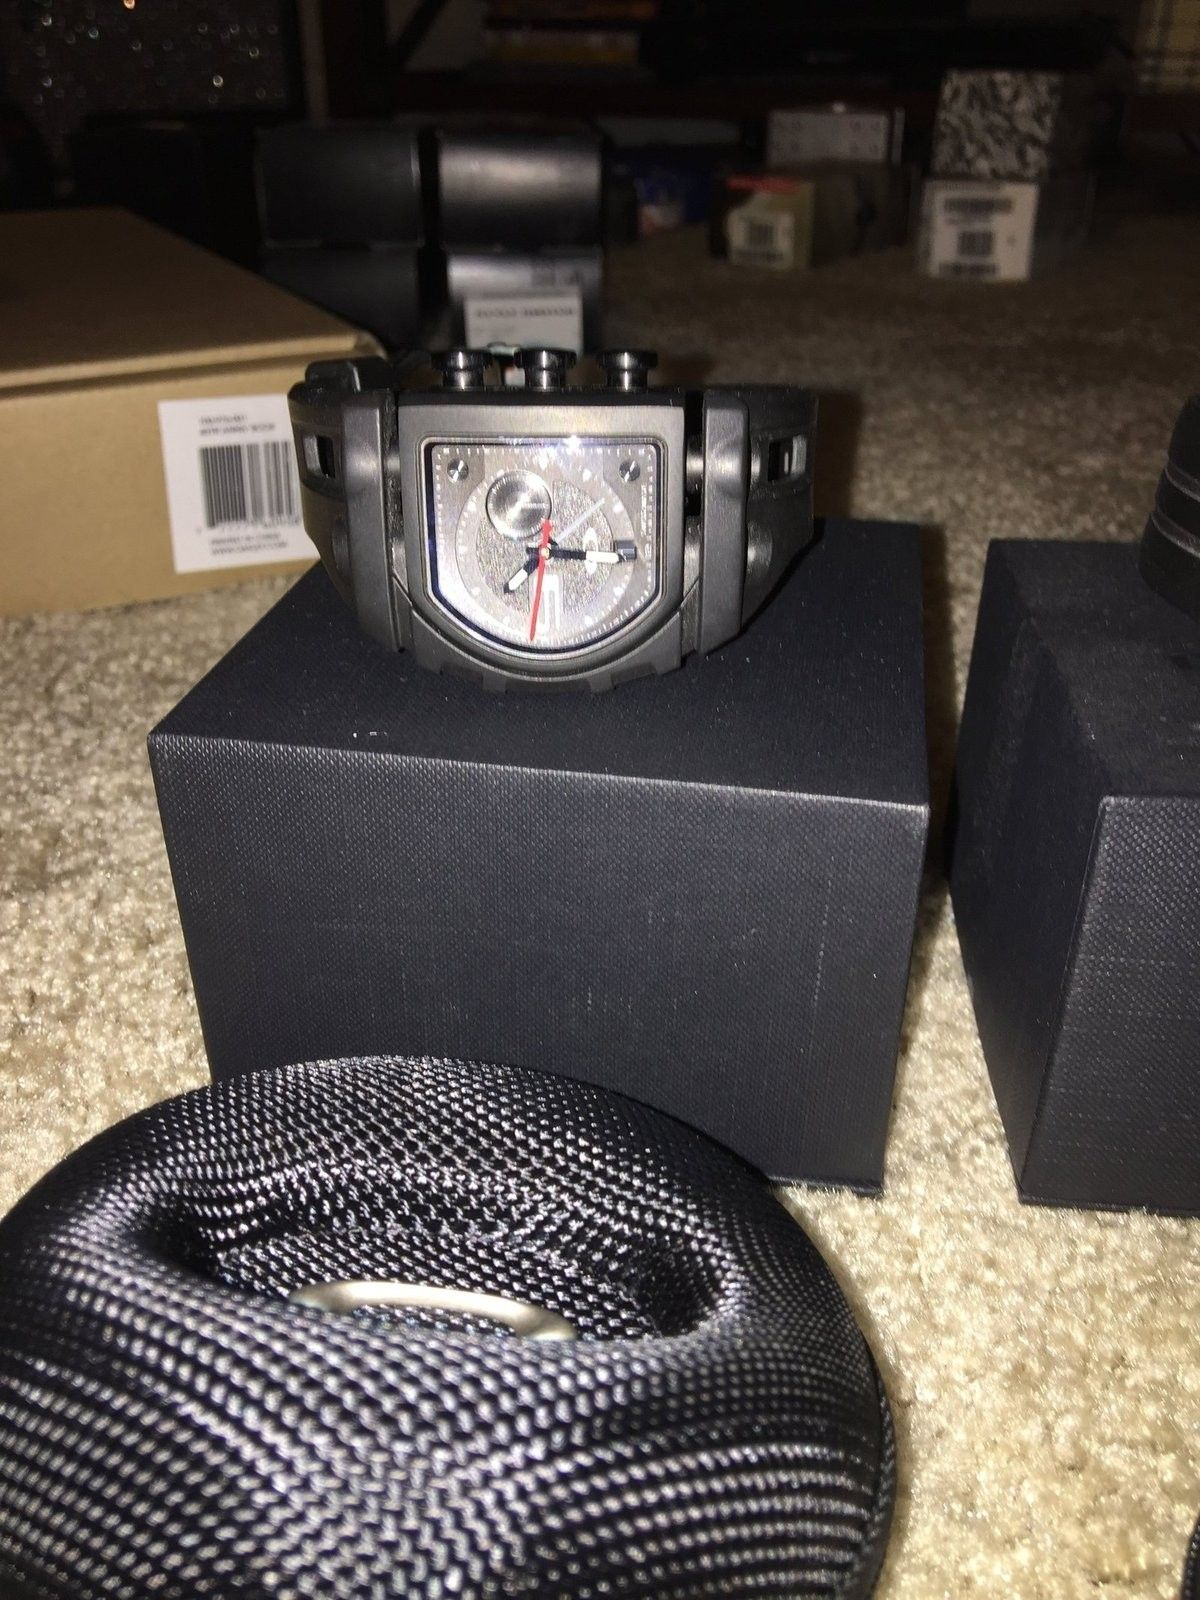 Fuse block and transfer case $400 shipped - image.jpeg